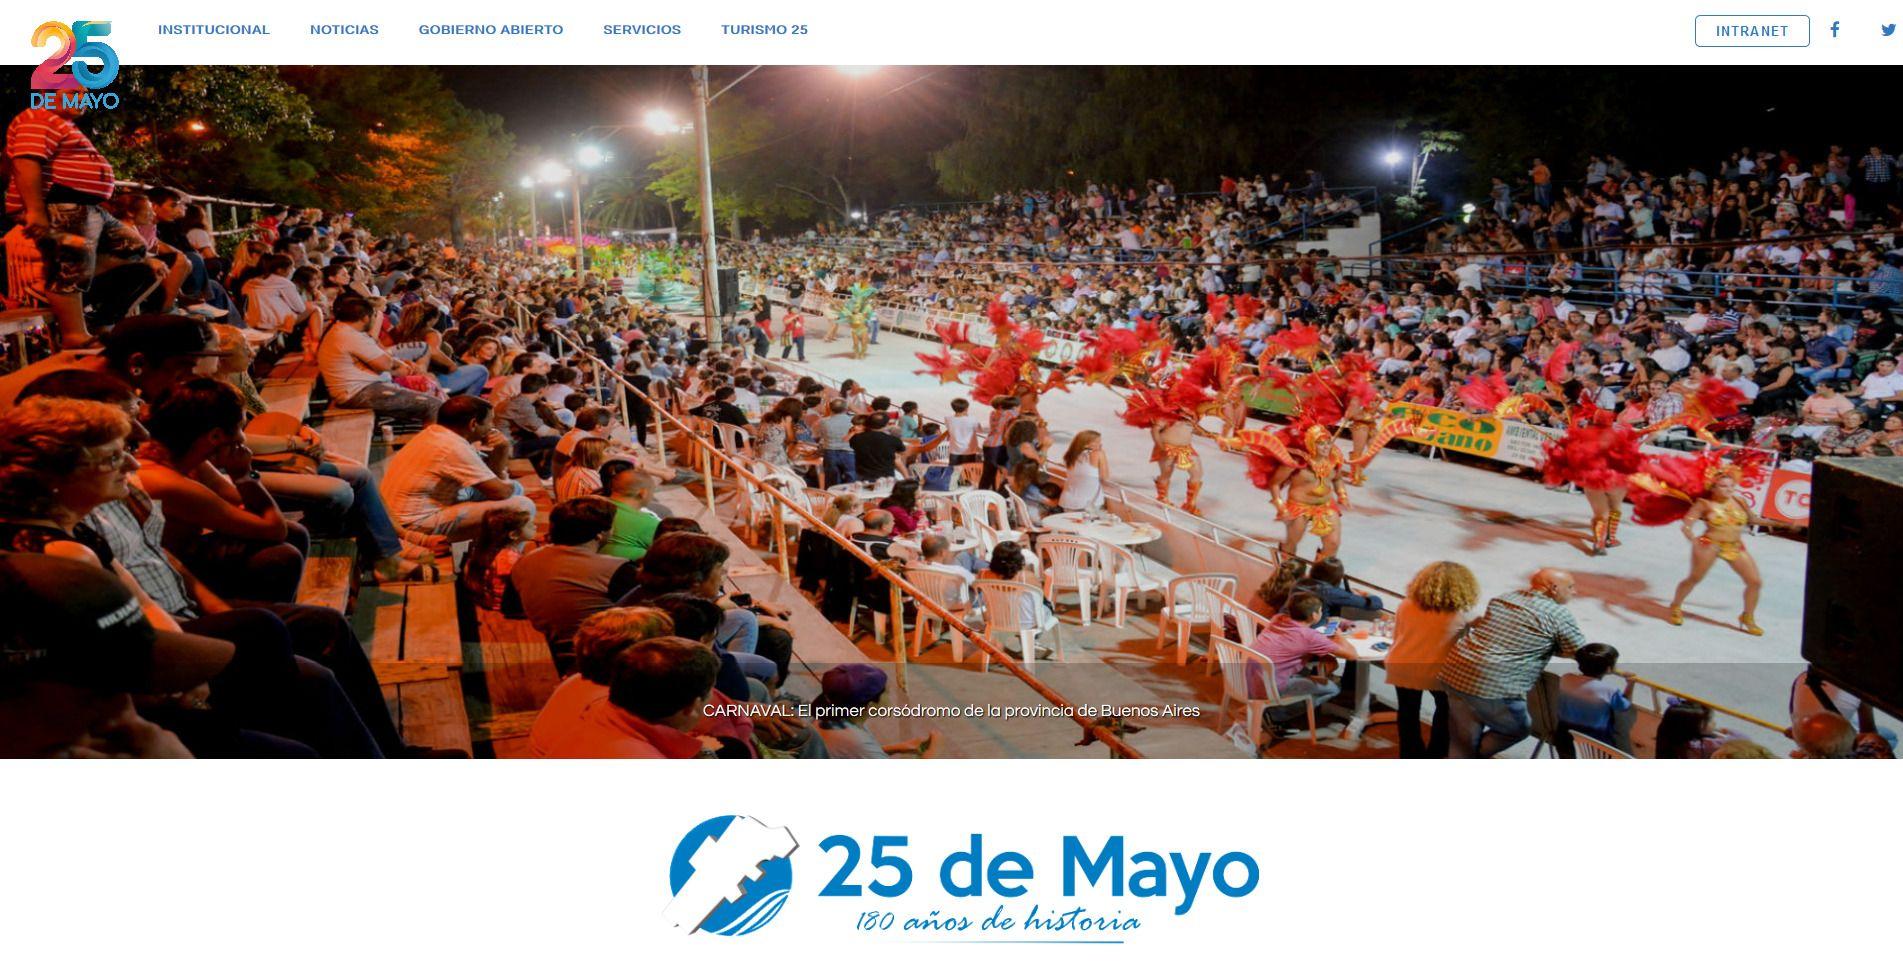 Municipio 25 de Mayo